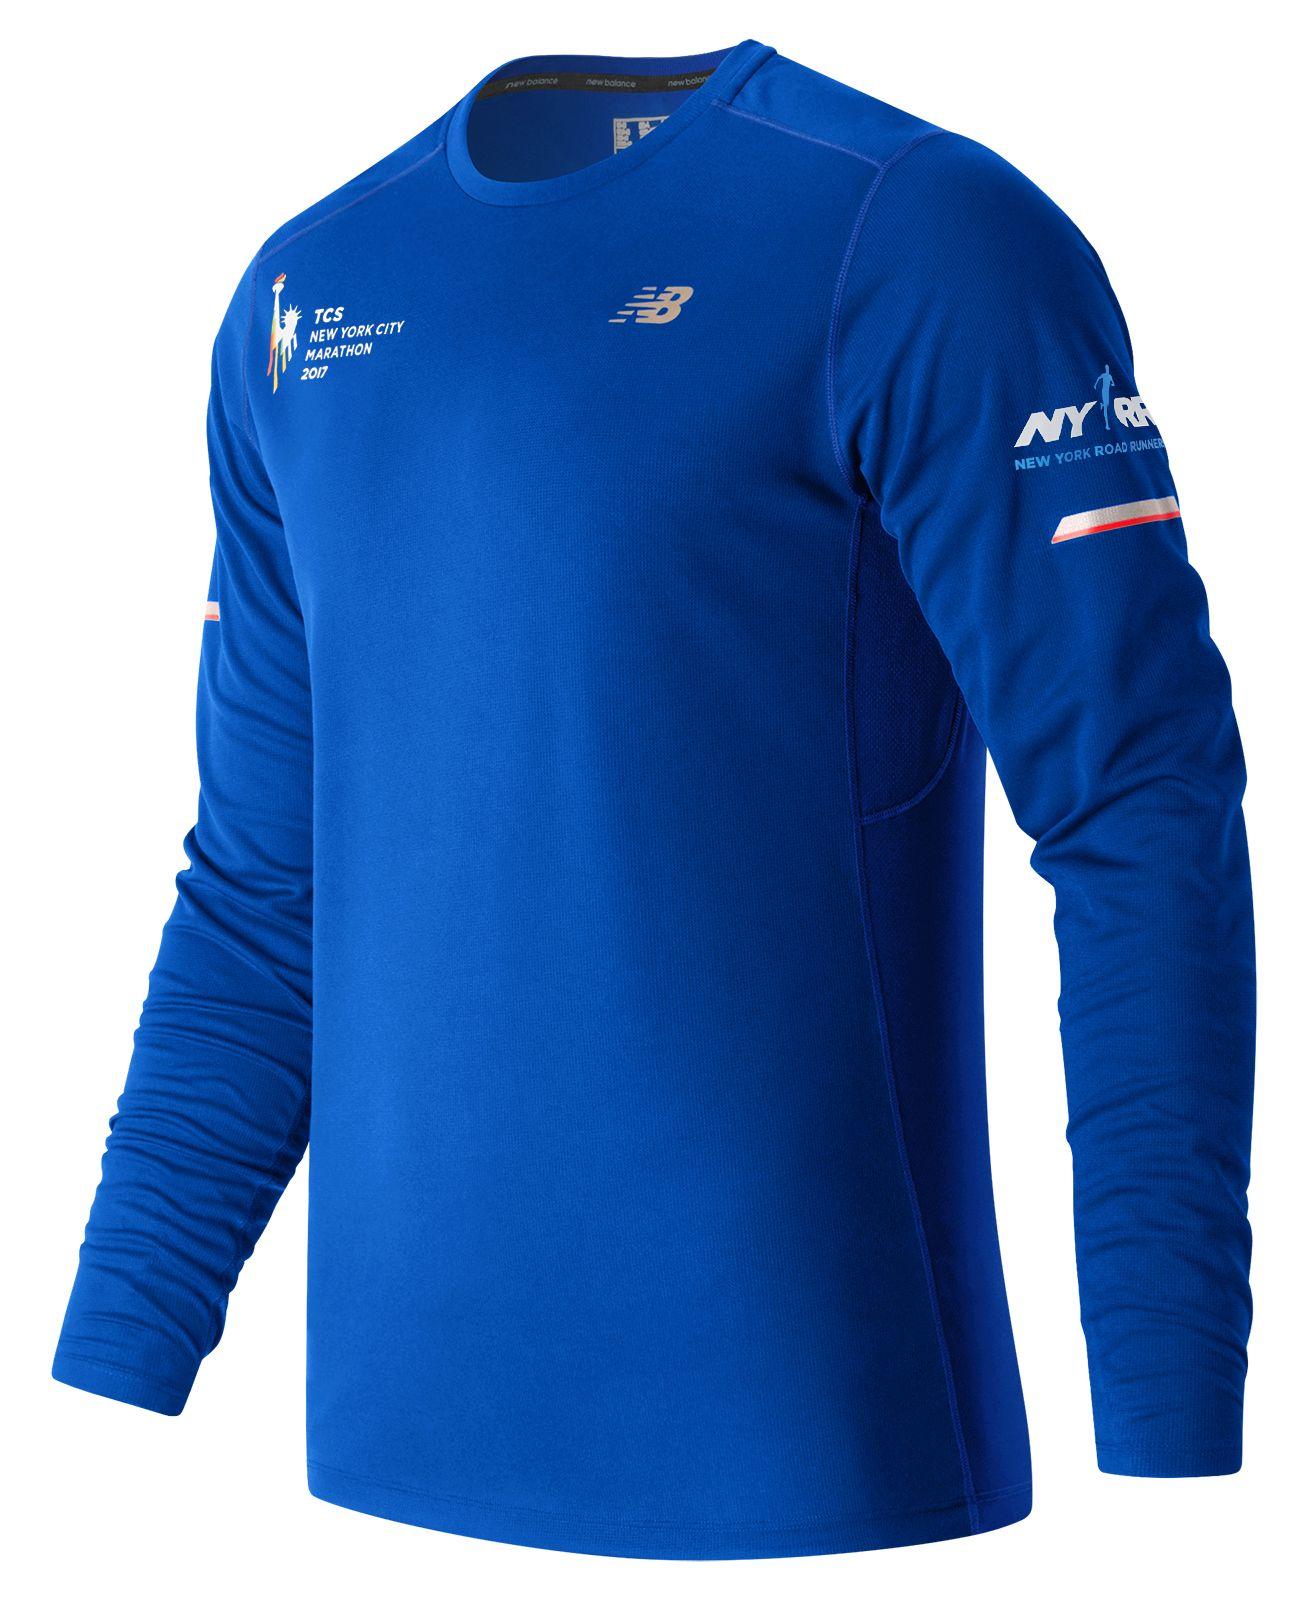 26a267a635600 New York Marathon Finisher T Shirt 2017 | Toffee Art